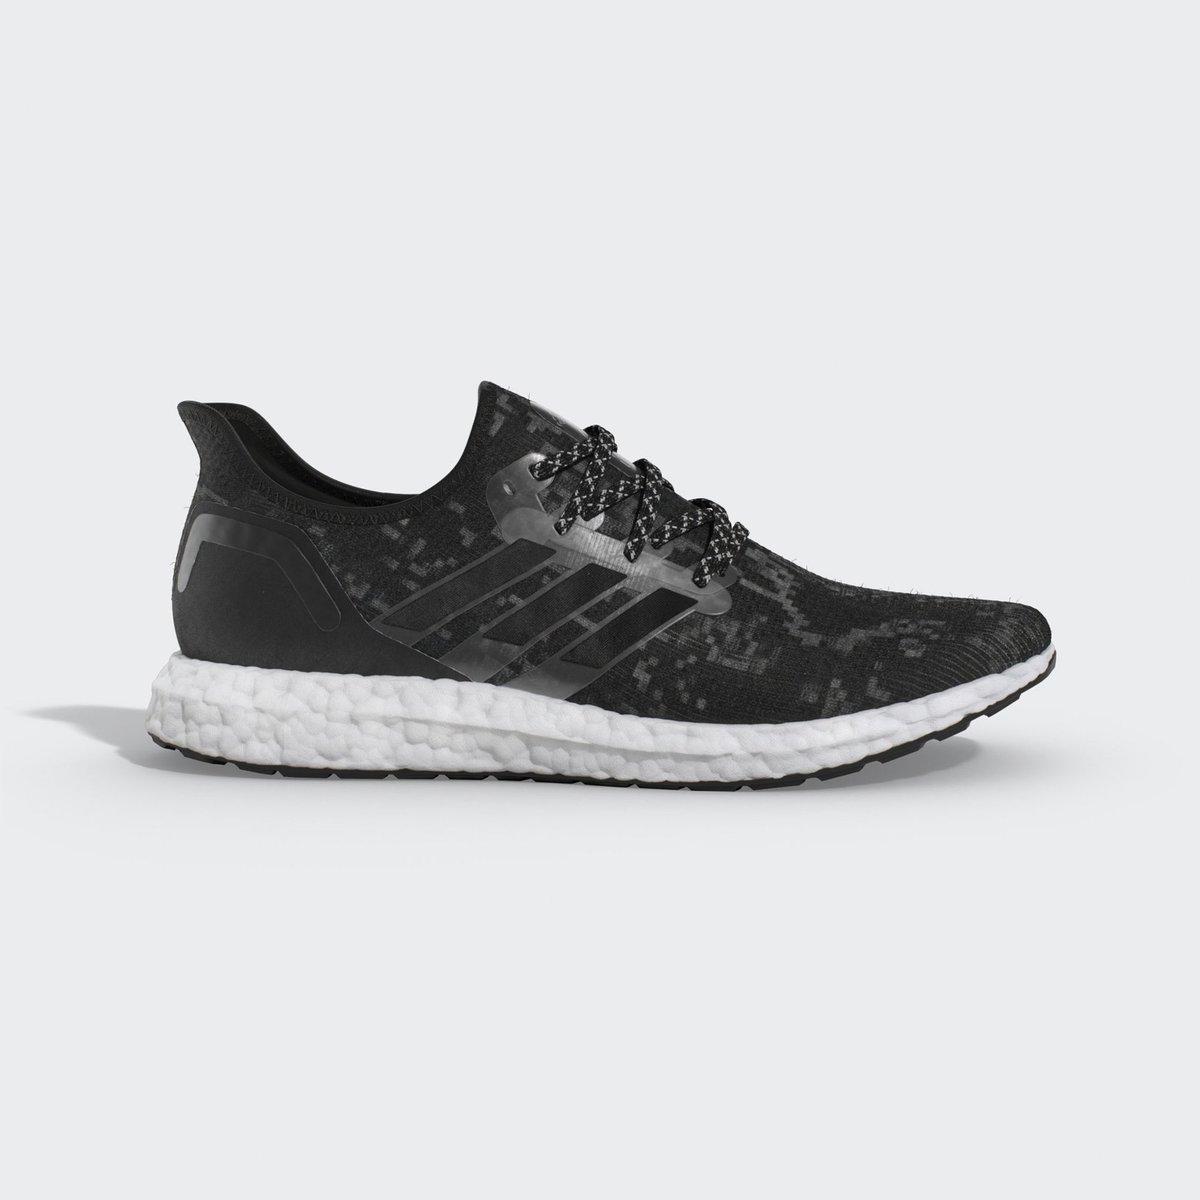 3fd82ad96 Now available on  adidas US. adidas AM4 Creators Club. —   http   bit.ly 2JdFqLM  adpic.twitter.com tCs3zl4XLo